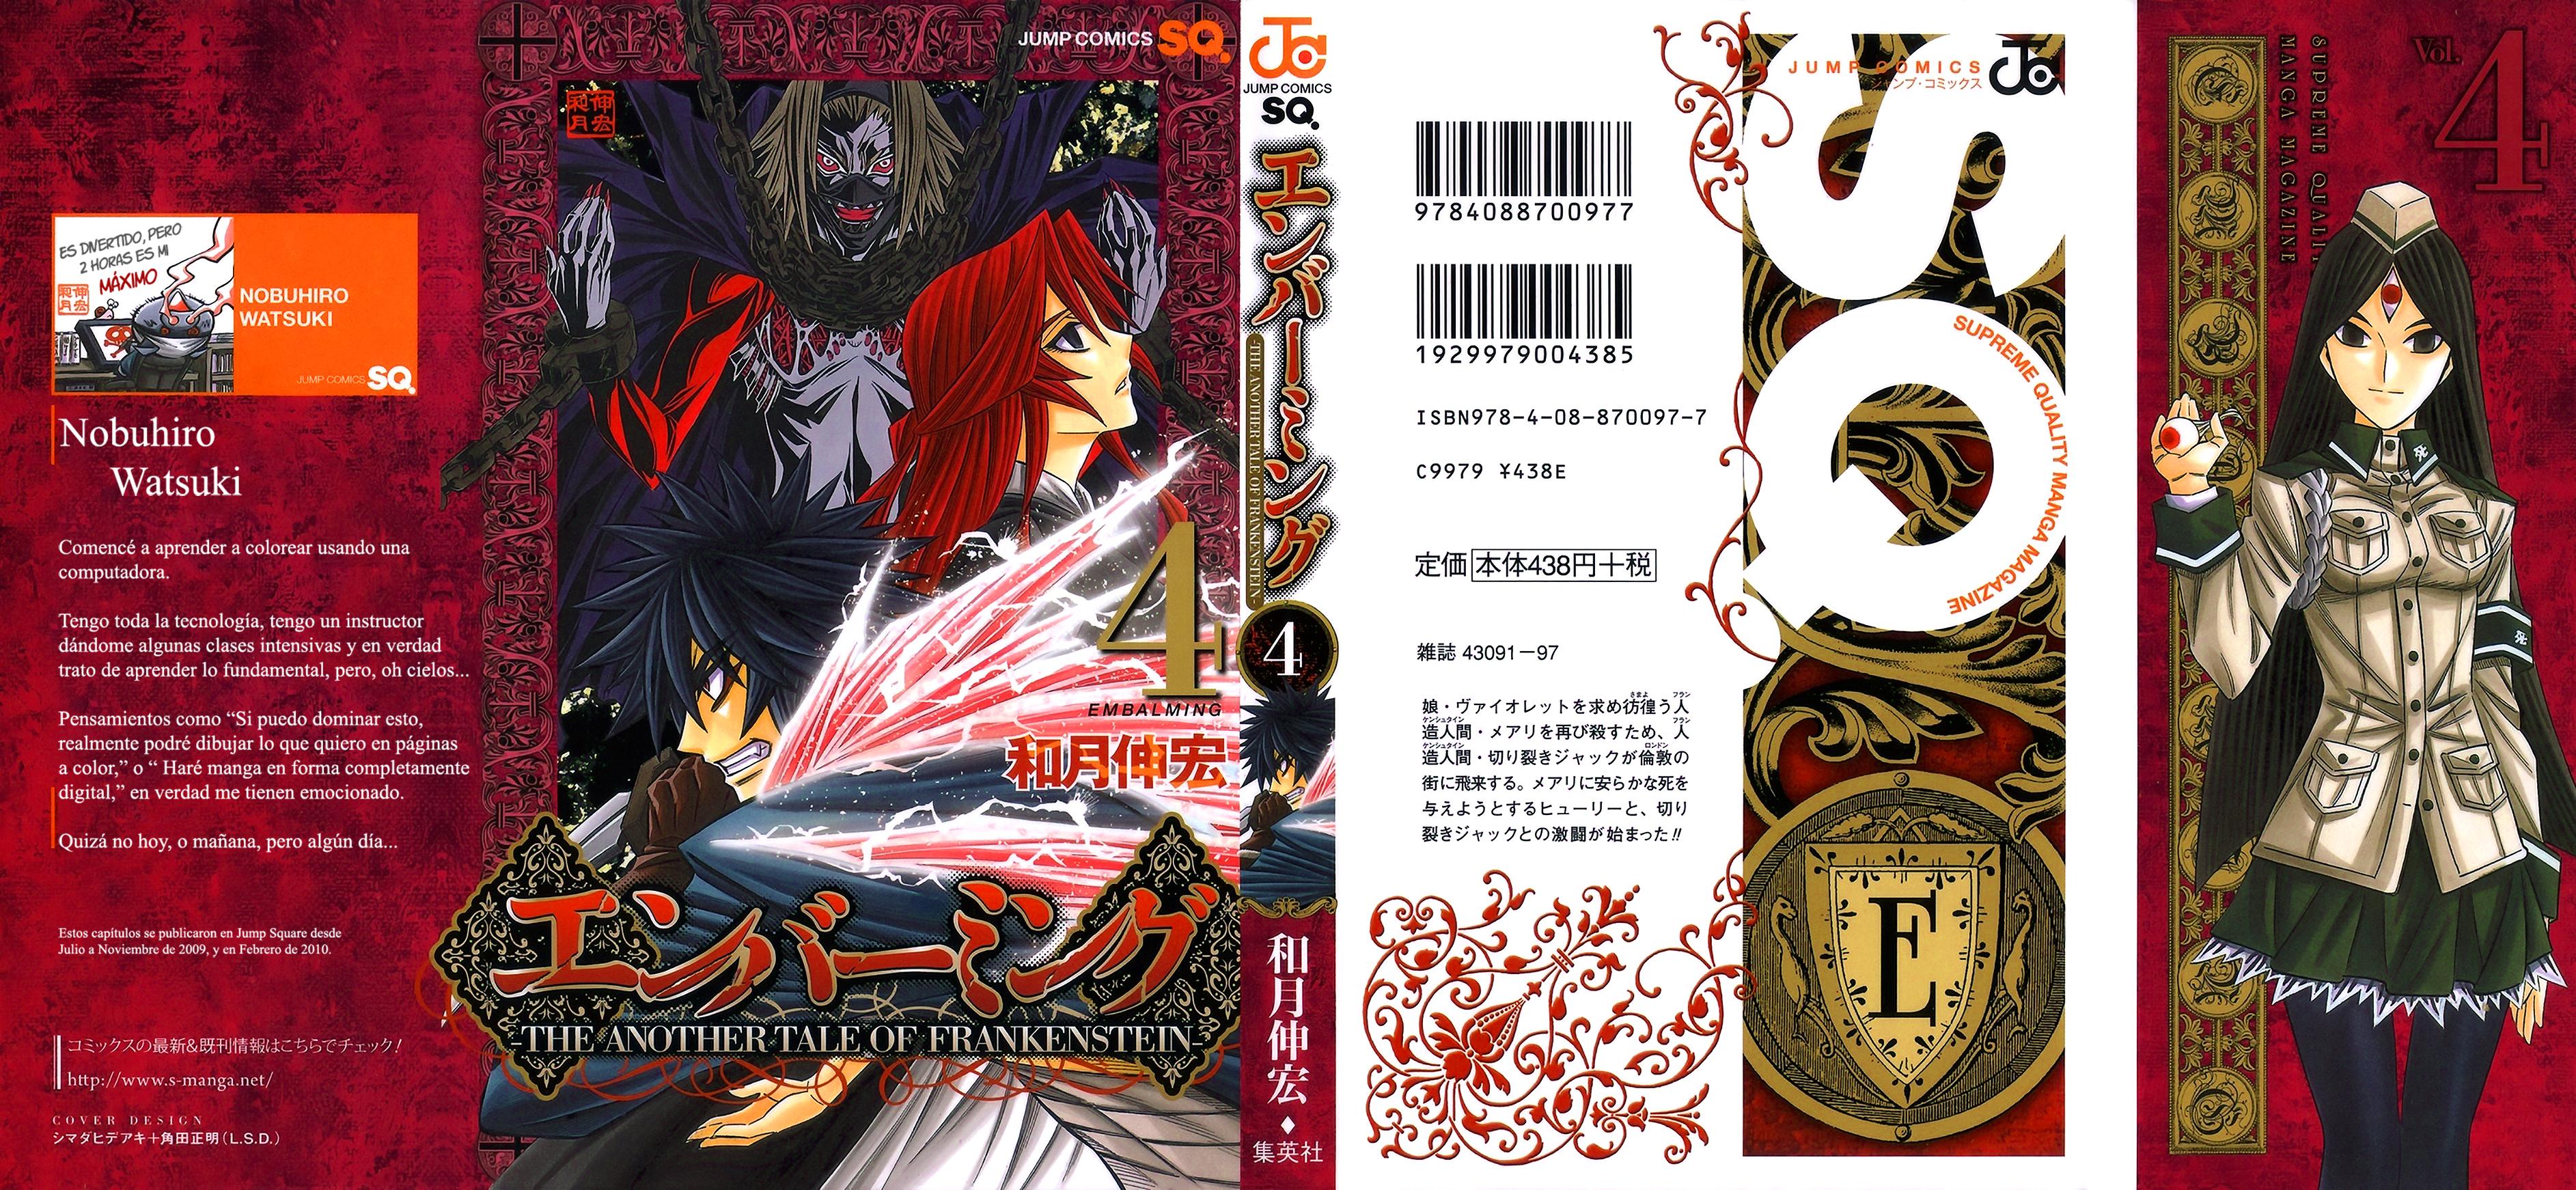 http://c5.ninemanga.com/es_manga/45/18797/447909/6796e70c5ee8d0b20fa54cd79a18b51b.jpg Page 1